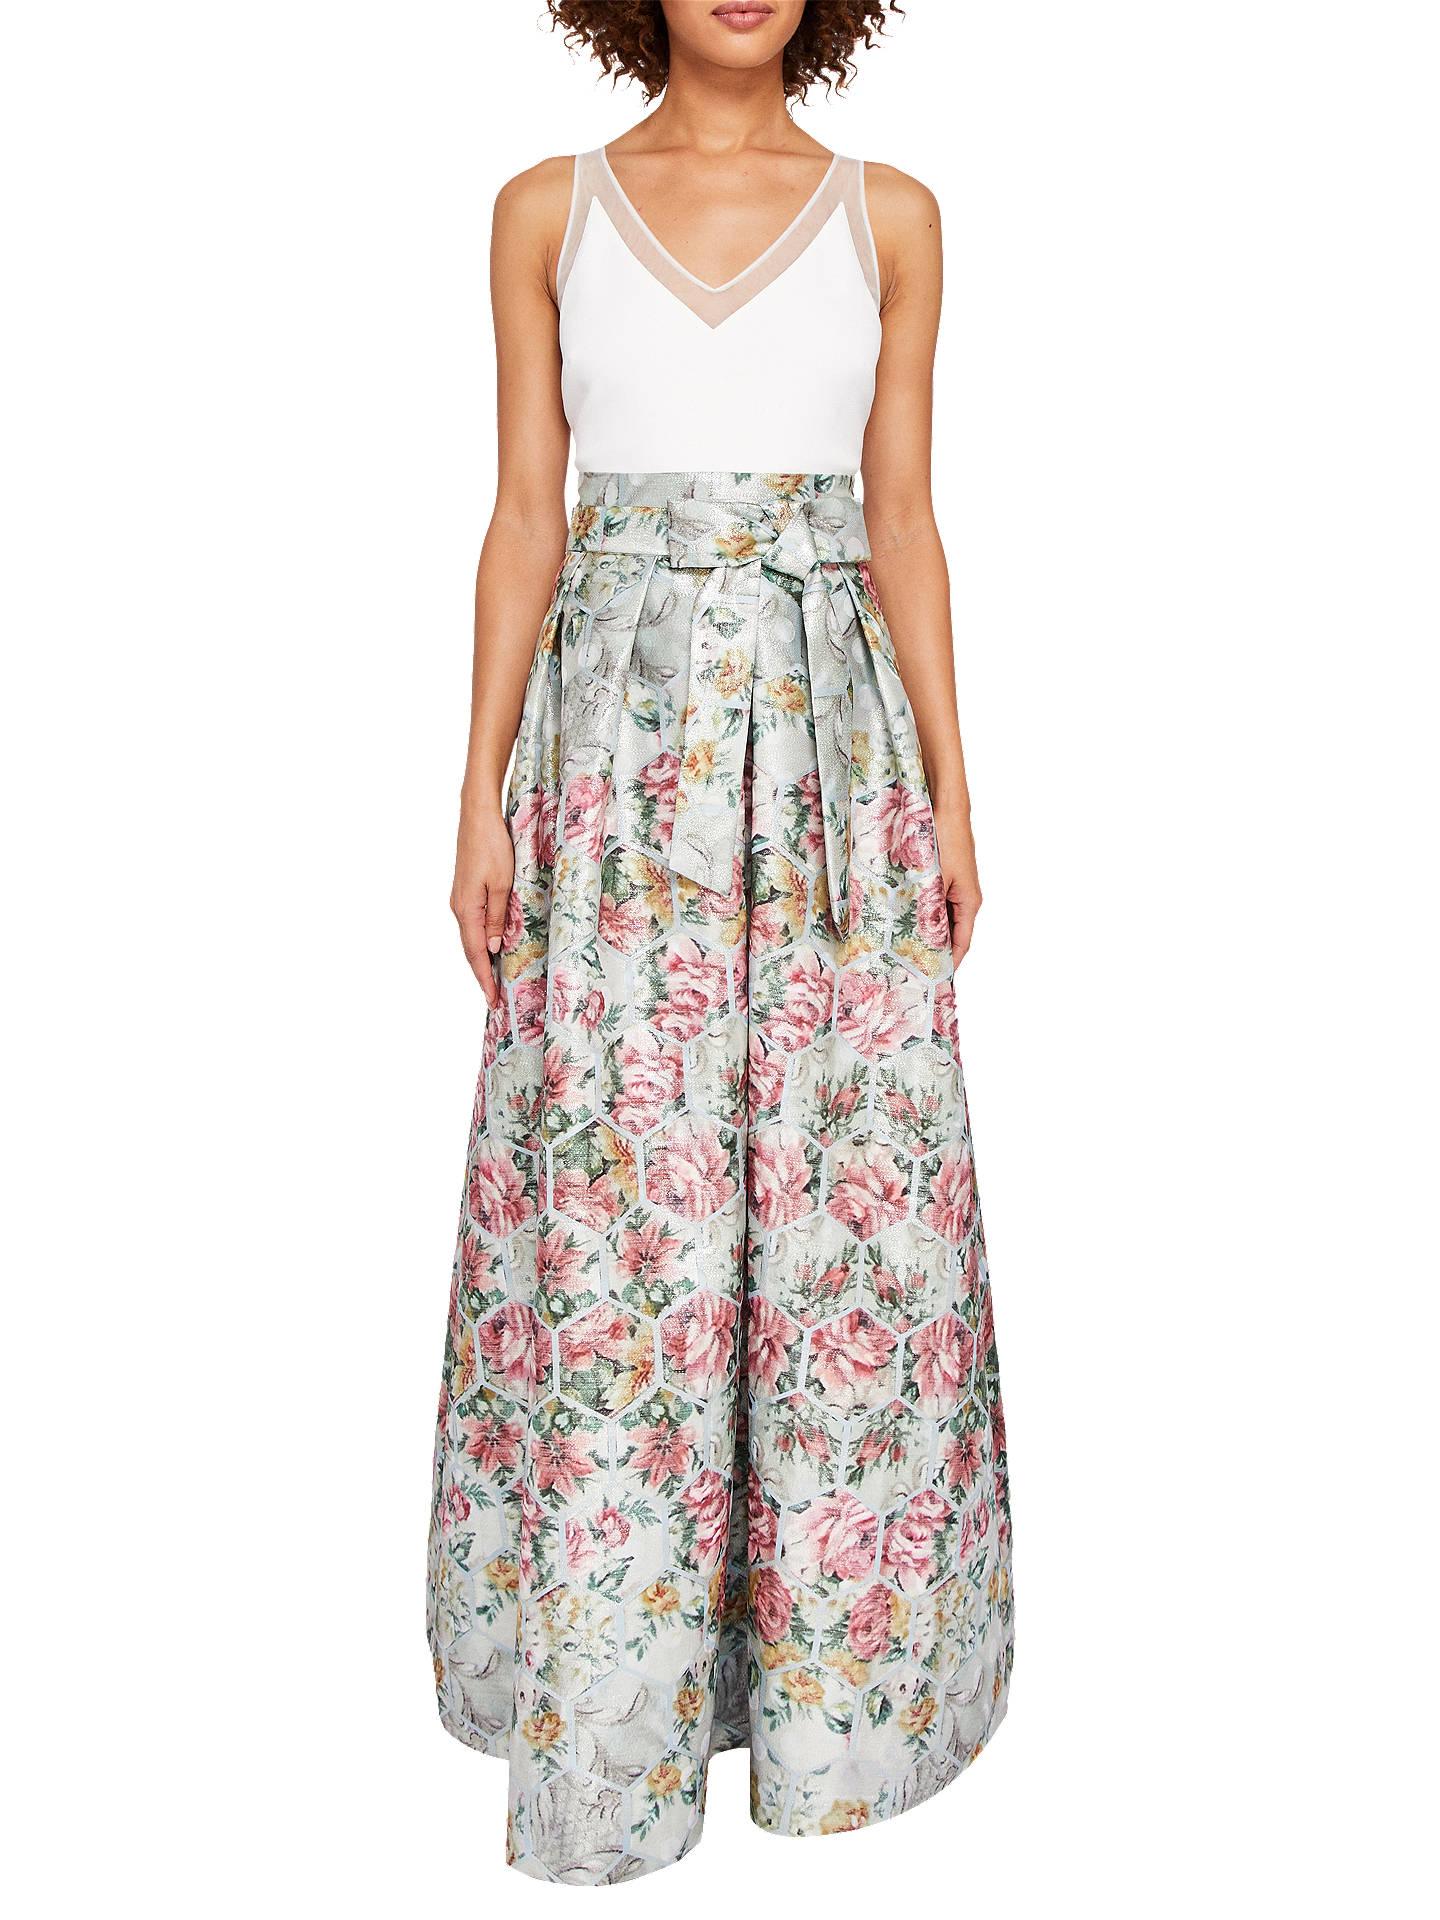 7ae8cc597f862 Buy Ted Baker Meigan Patchwork Maxi Dress